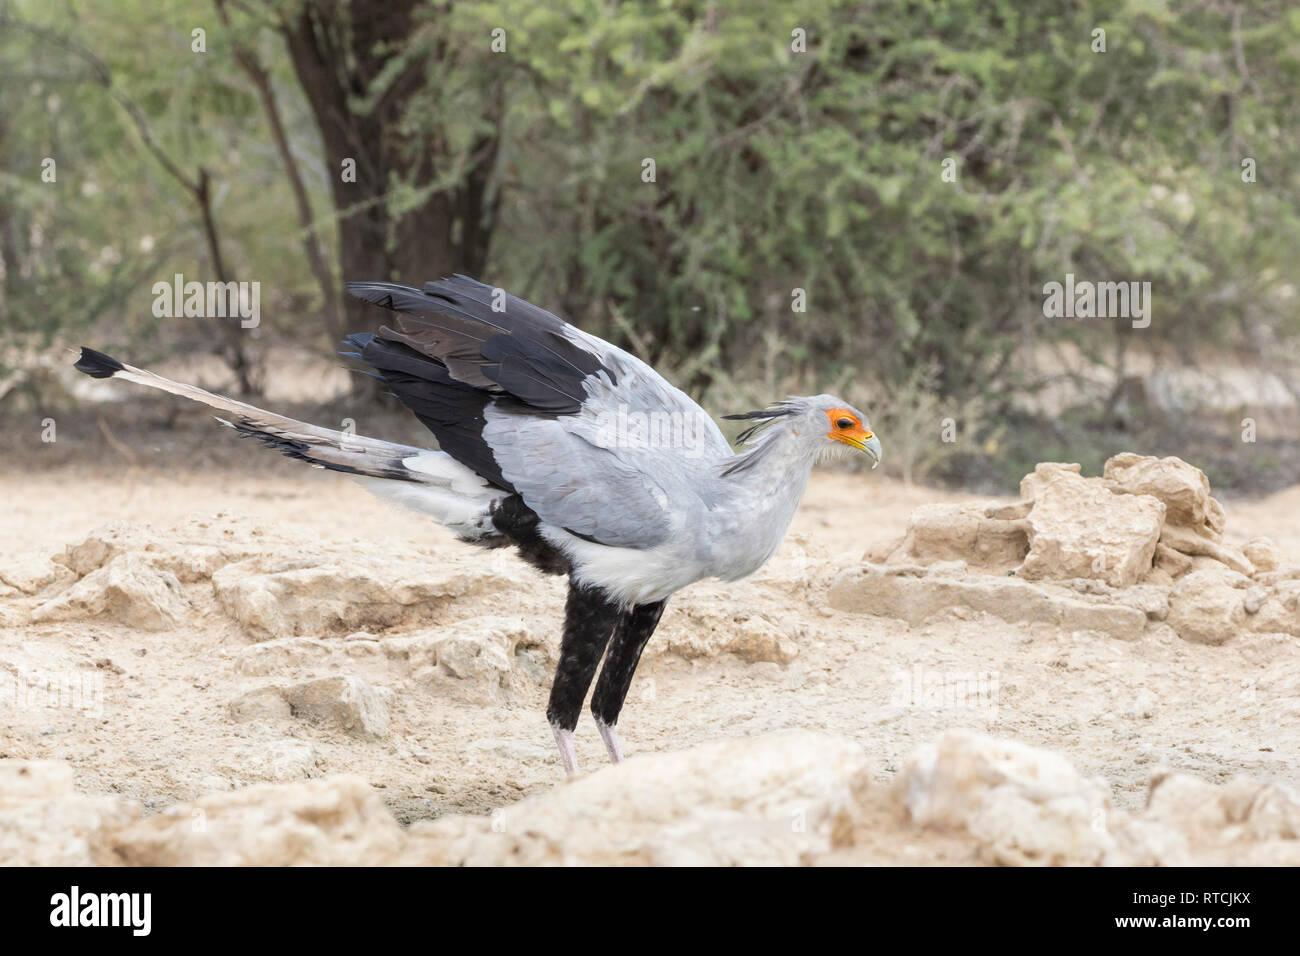 Secretary bird, Sagittarius serpentarius, in a waterhole near Nossob, Kgalagadi Transfrontier Park, Kalahari, Northern Cape, South Africa. Side view Stock Photo